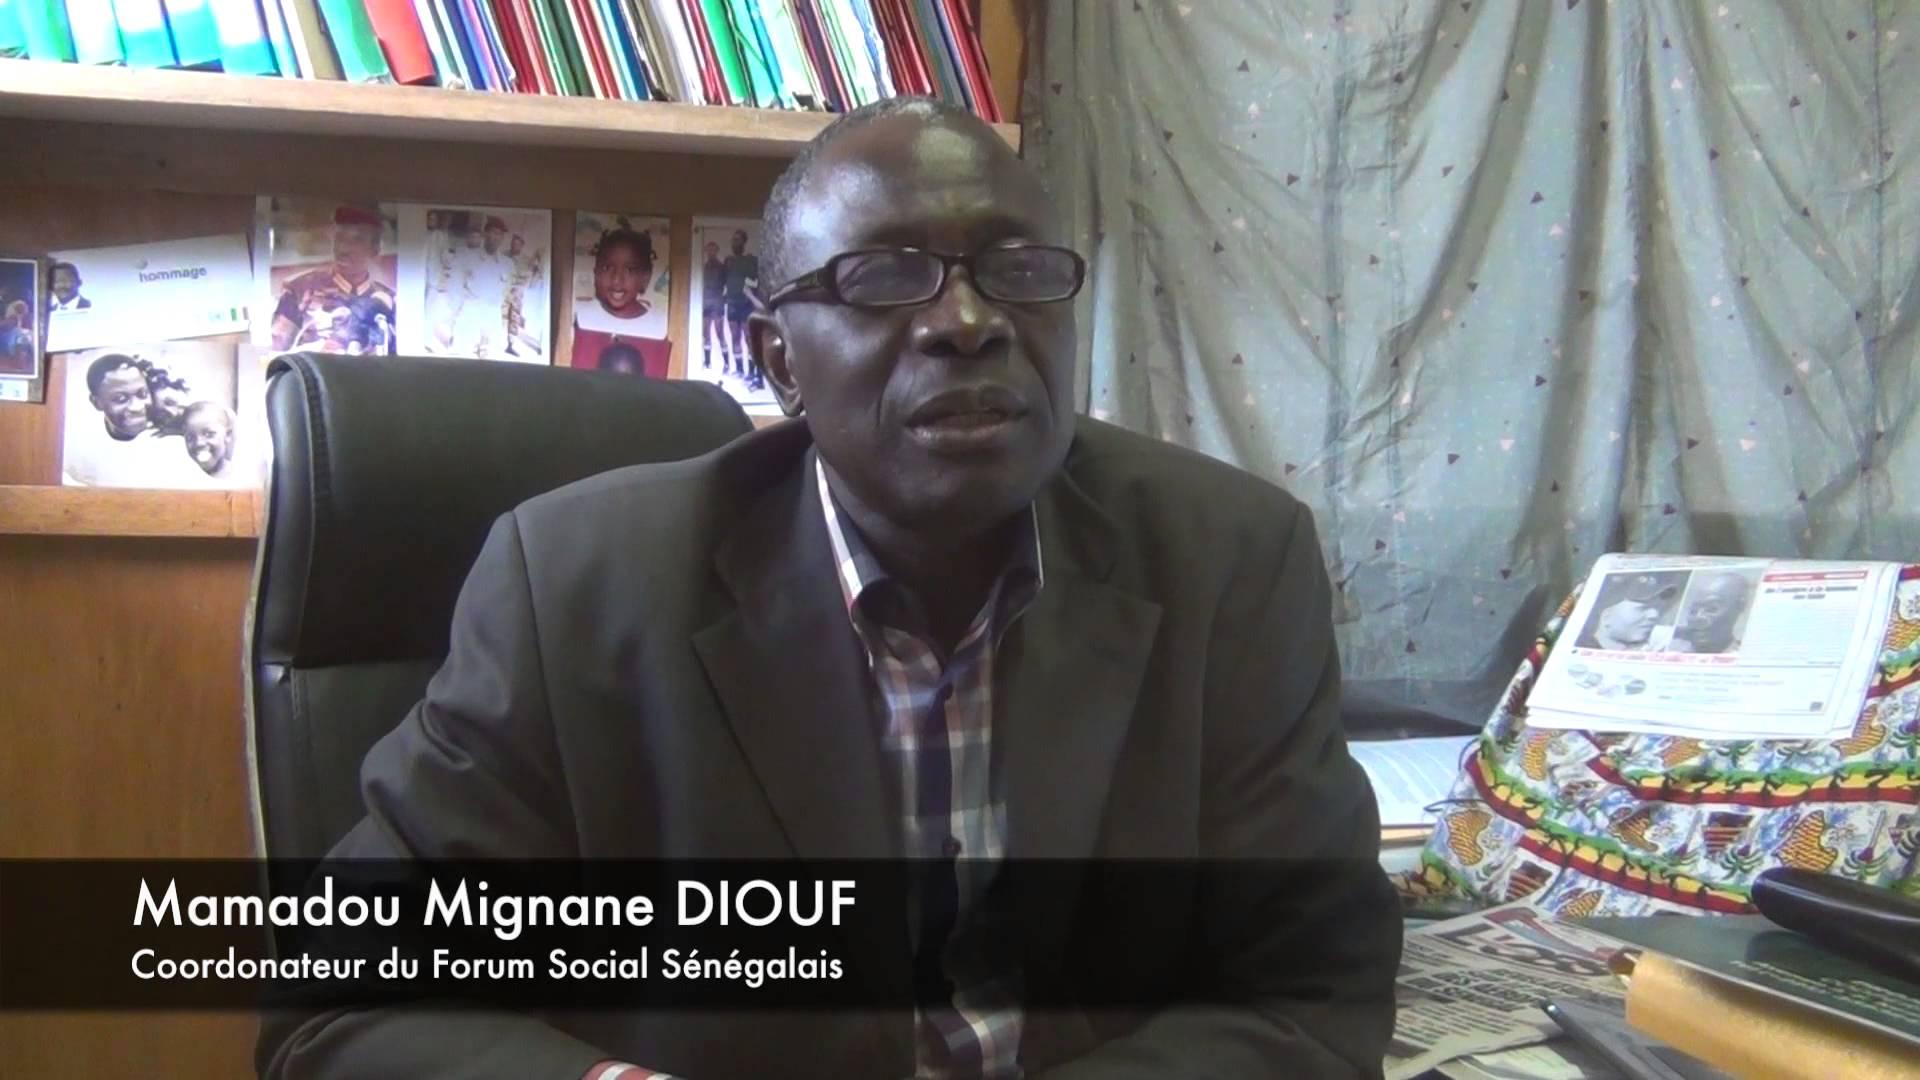 Mamadou Mignane Diouf, coordonnateu du FSSr